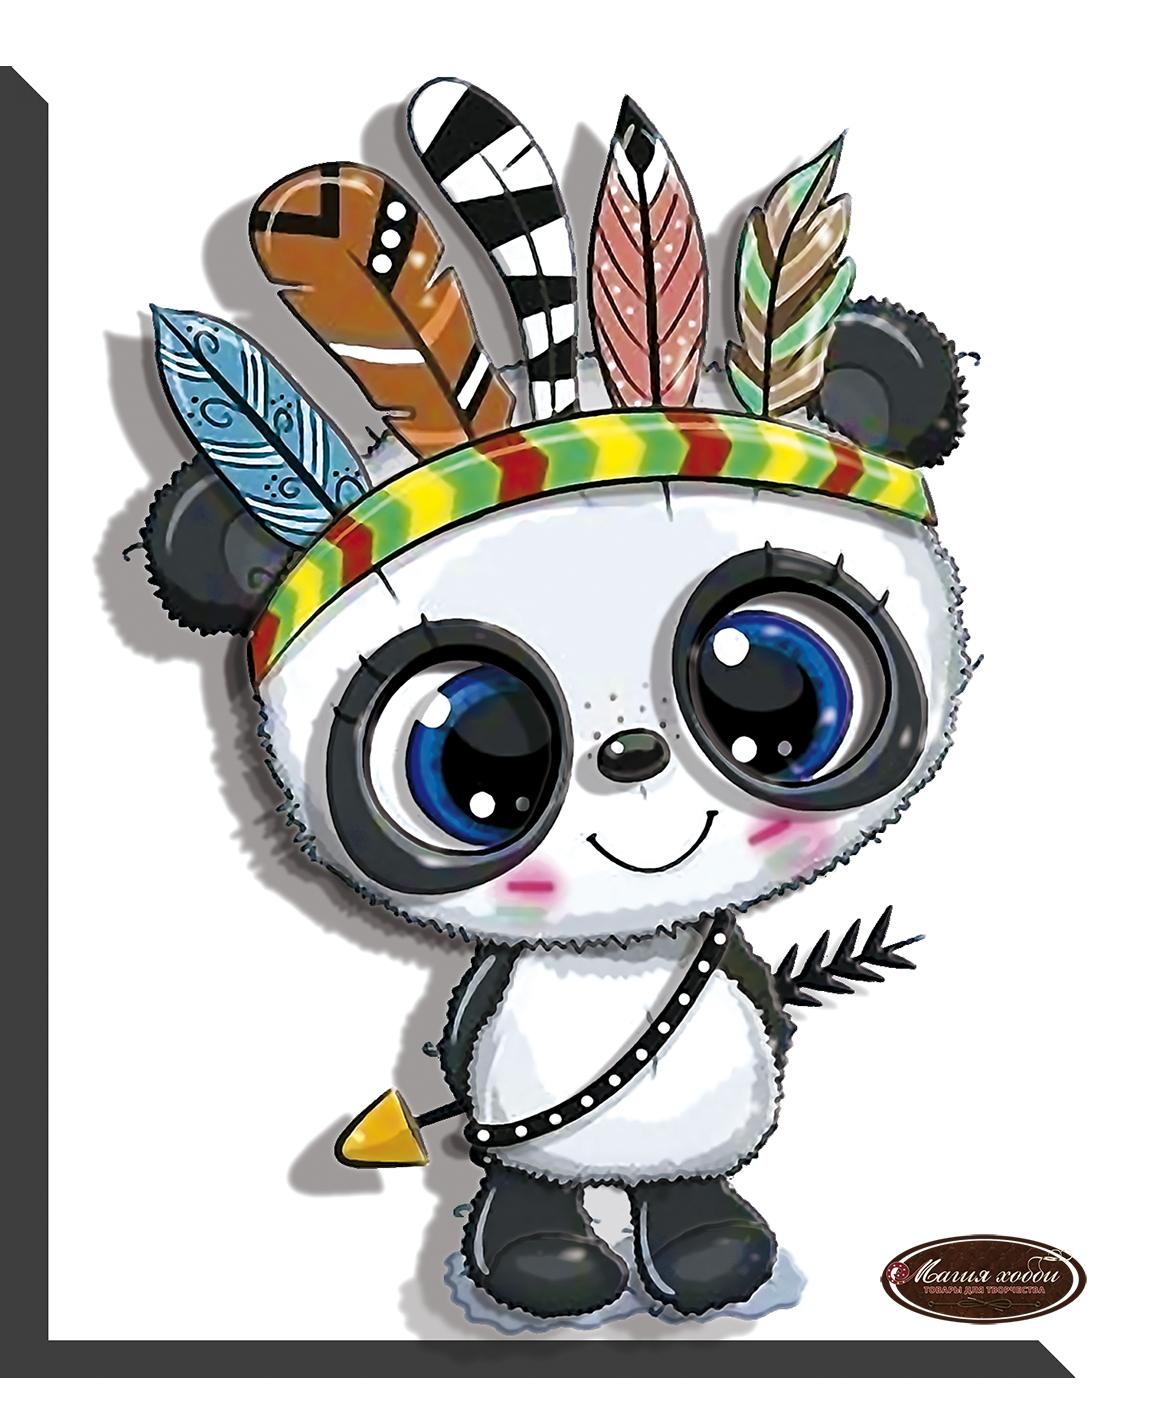 Панда  команчи, Размер: 11*13